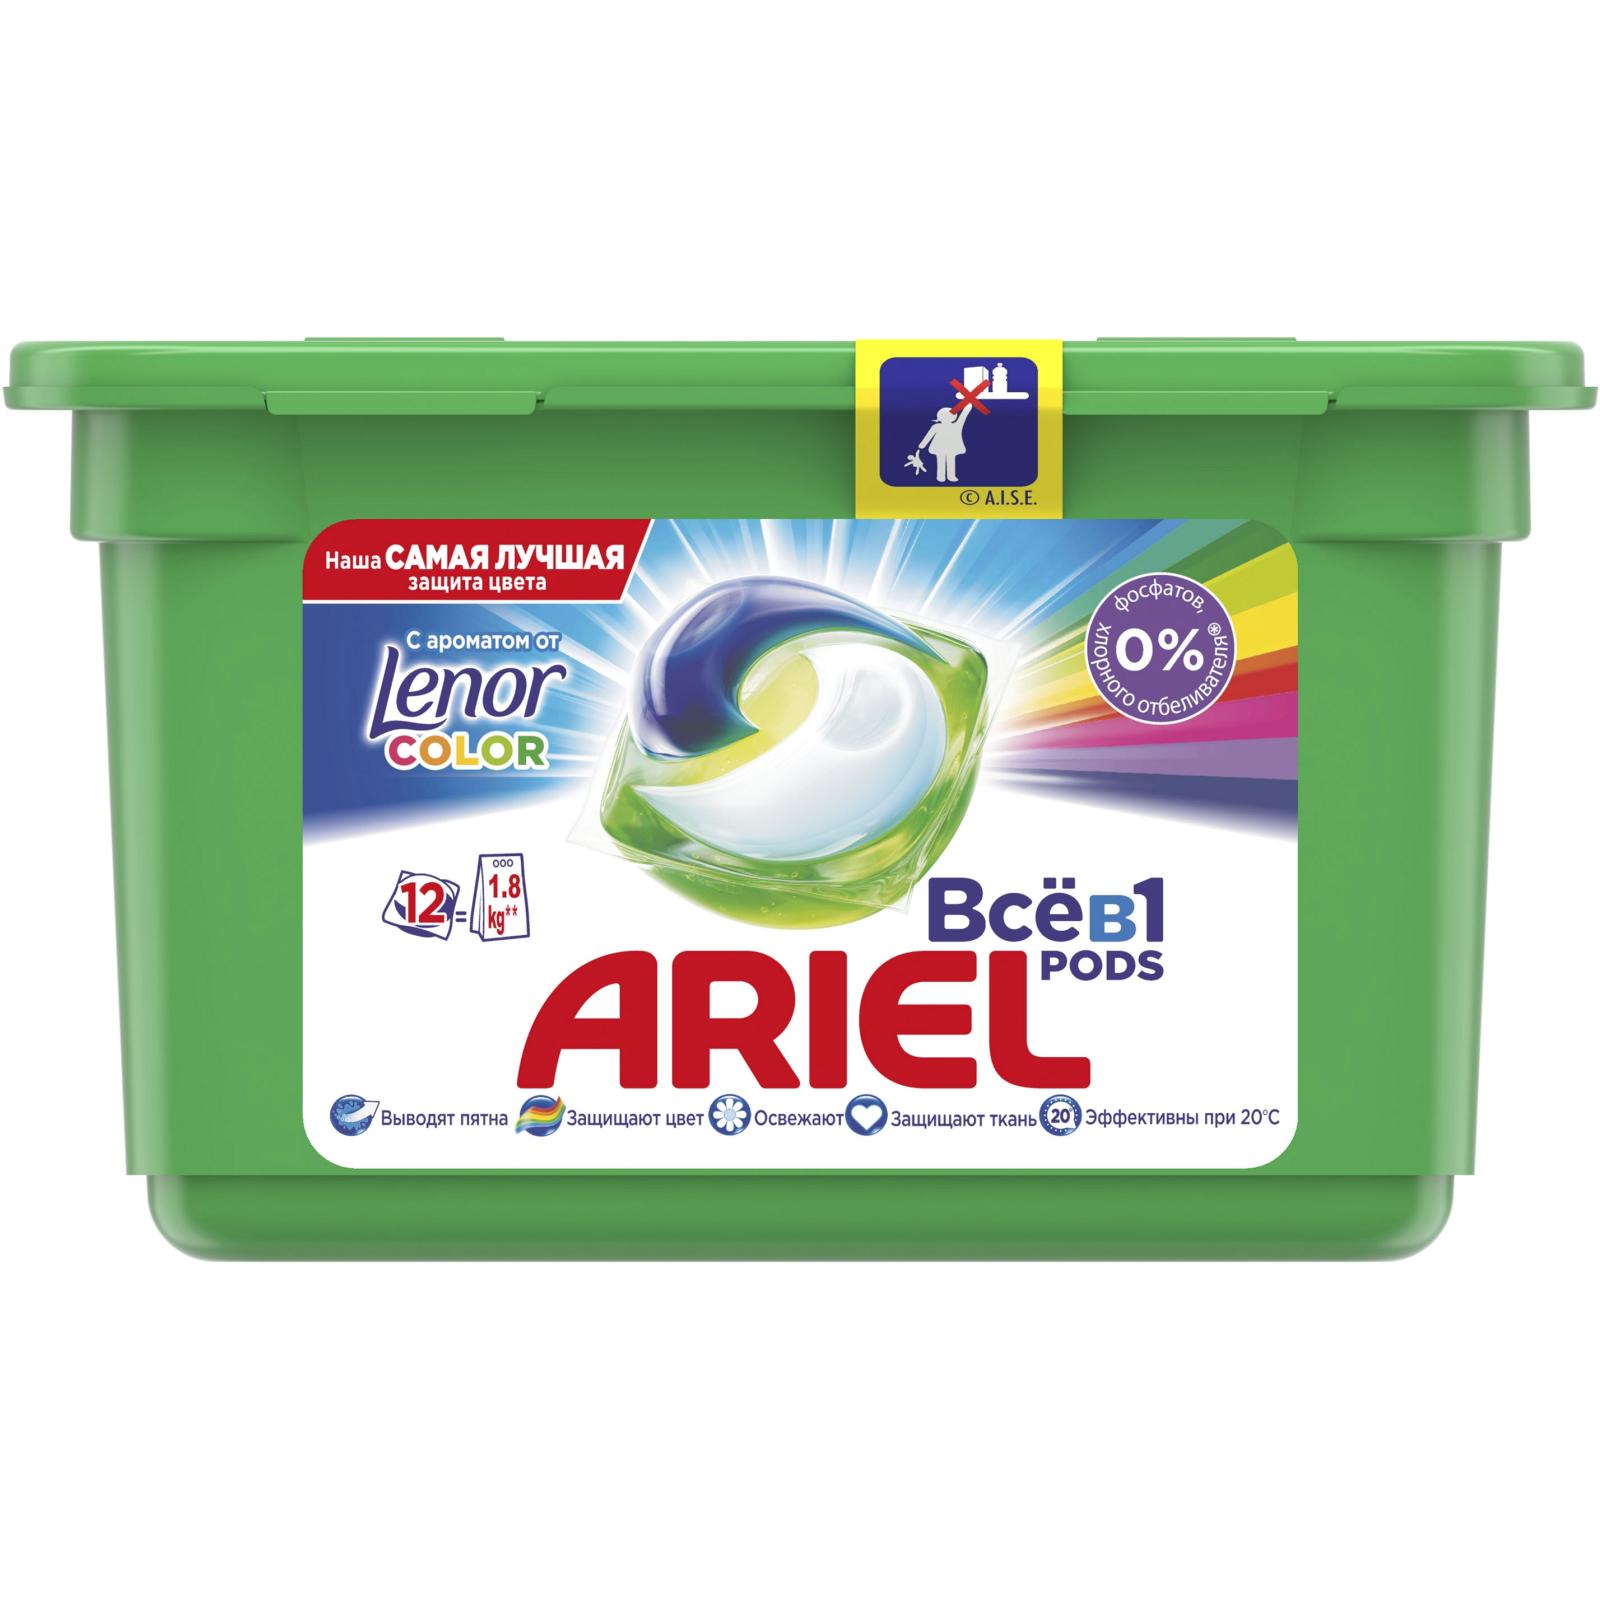 Капсулы для стирки Ariel Pods Touch of Lenor Fresh 30 шт (4015600950972)